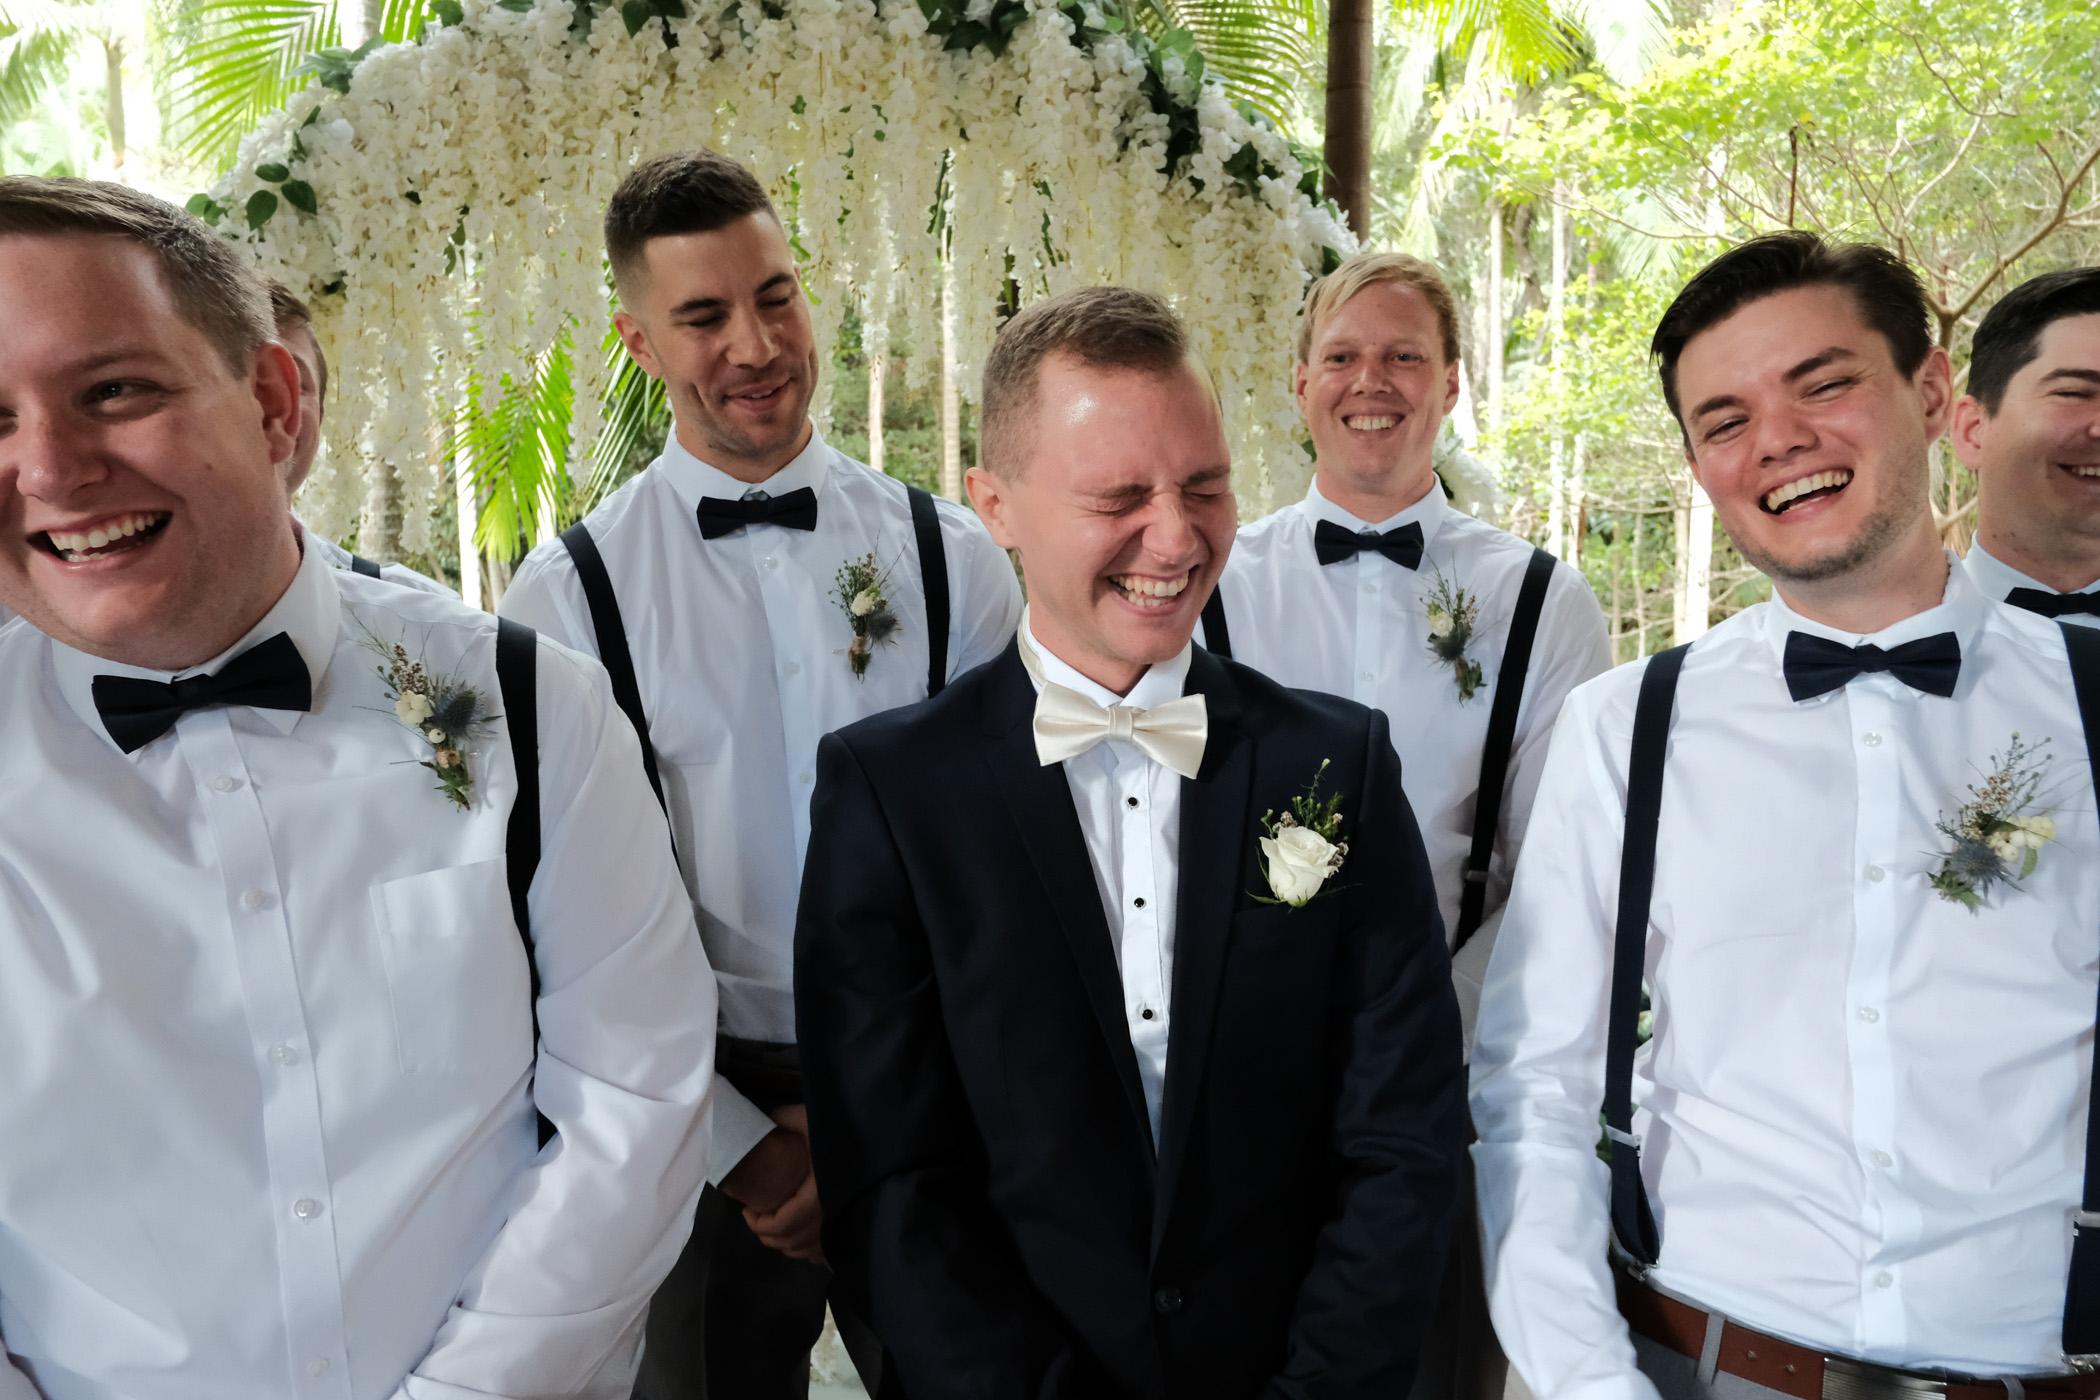 2018.04-Ceder-Creek-lodges-BLOG-Wedding-Web-Res_Leisure-Lane-Photo-3.jpg